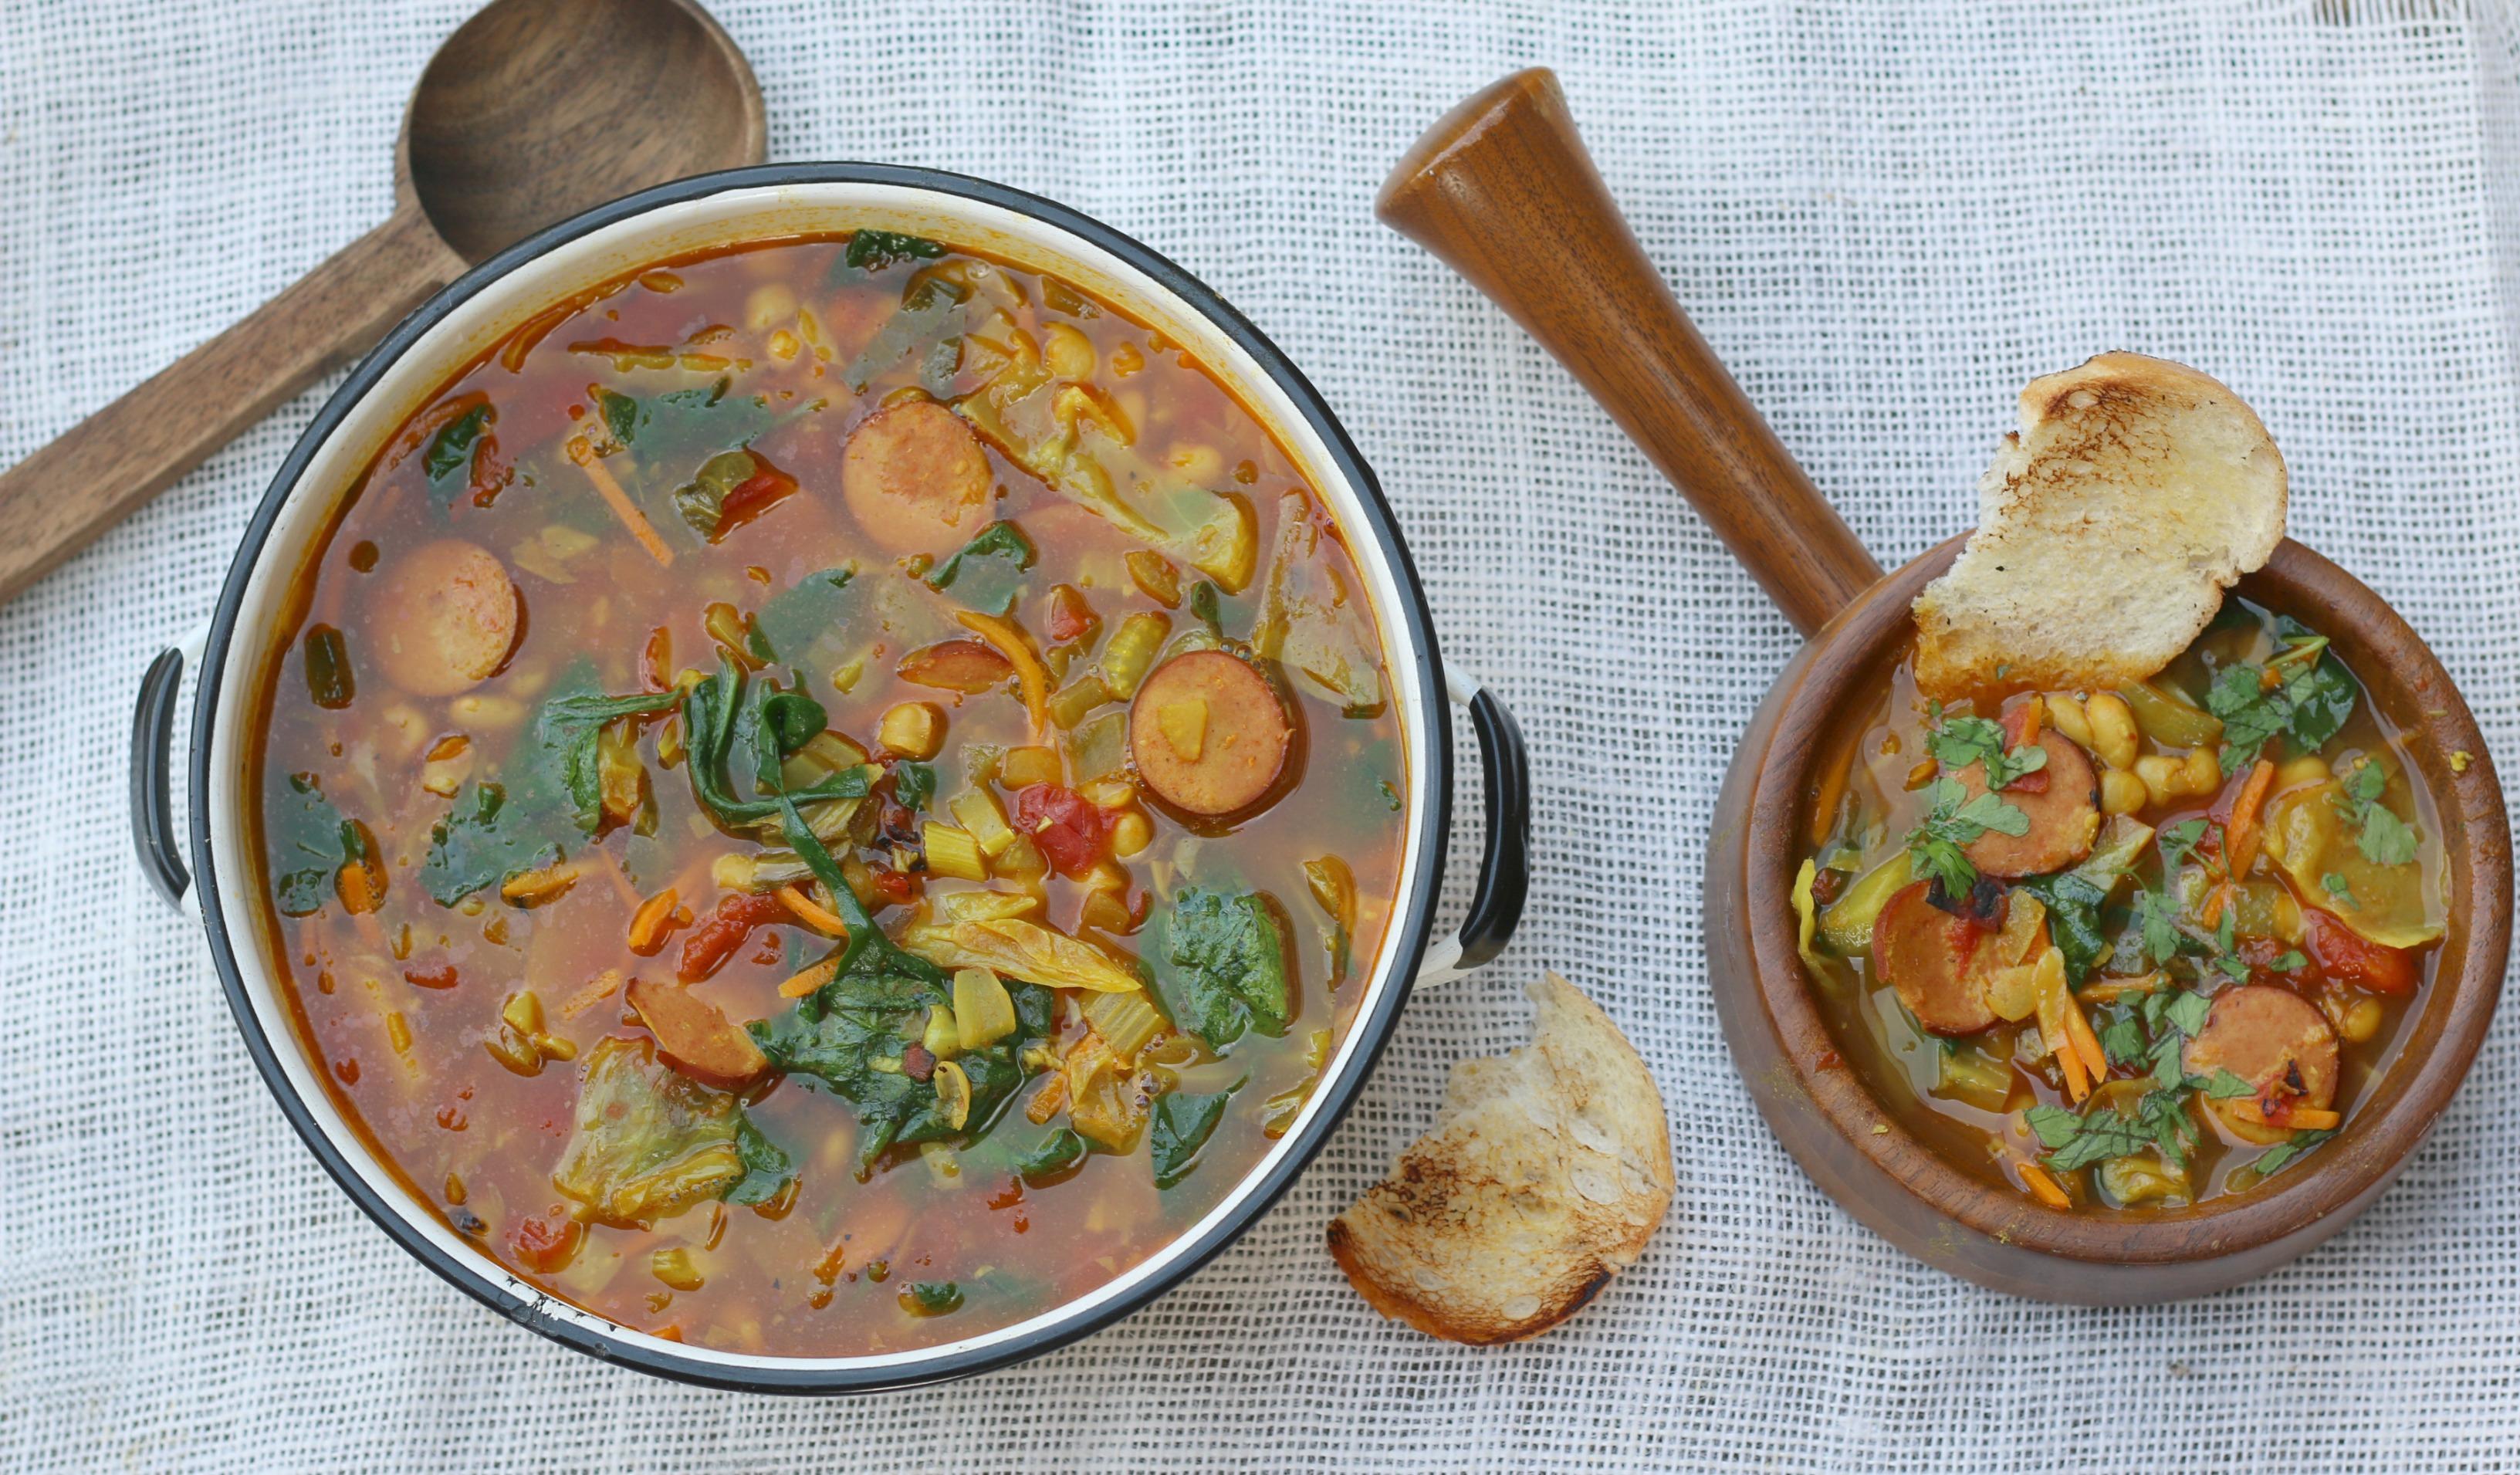 Kielbasa Bean and cabbage soup